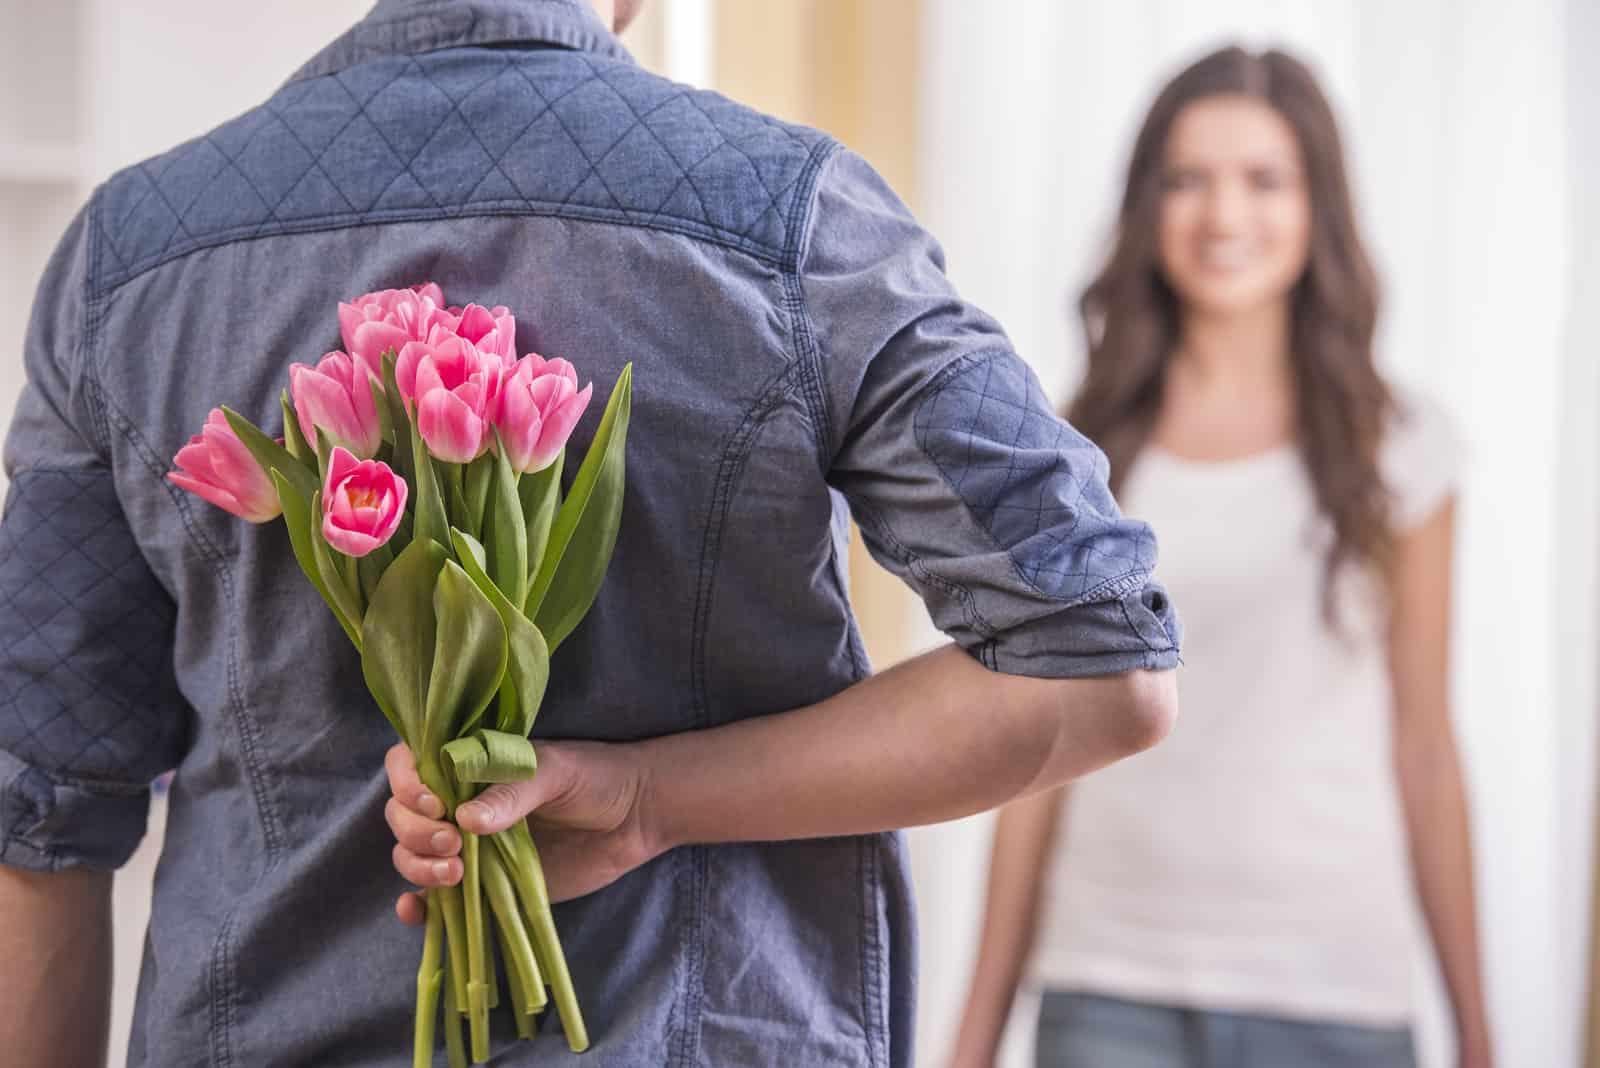 junger Mann versteckt Blumen hinter seinem Rücken